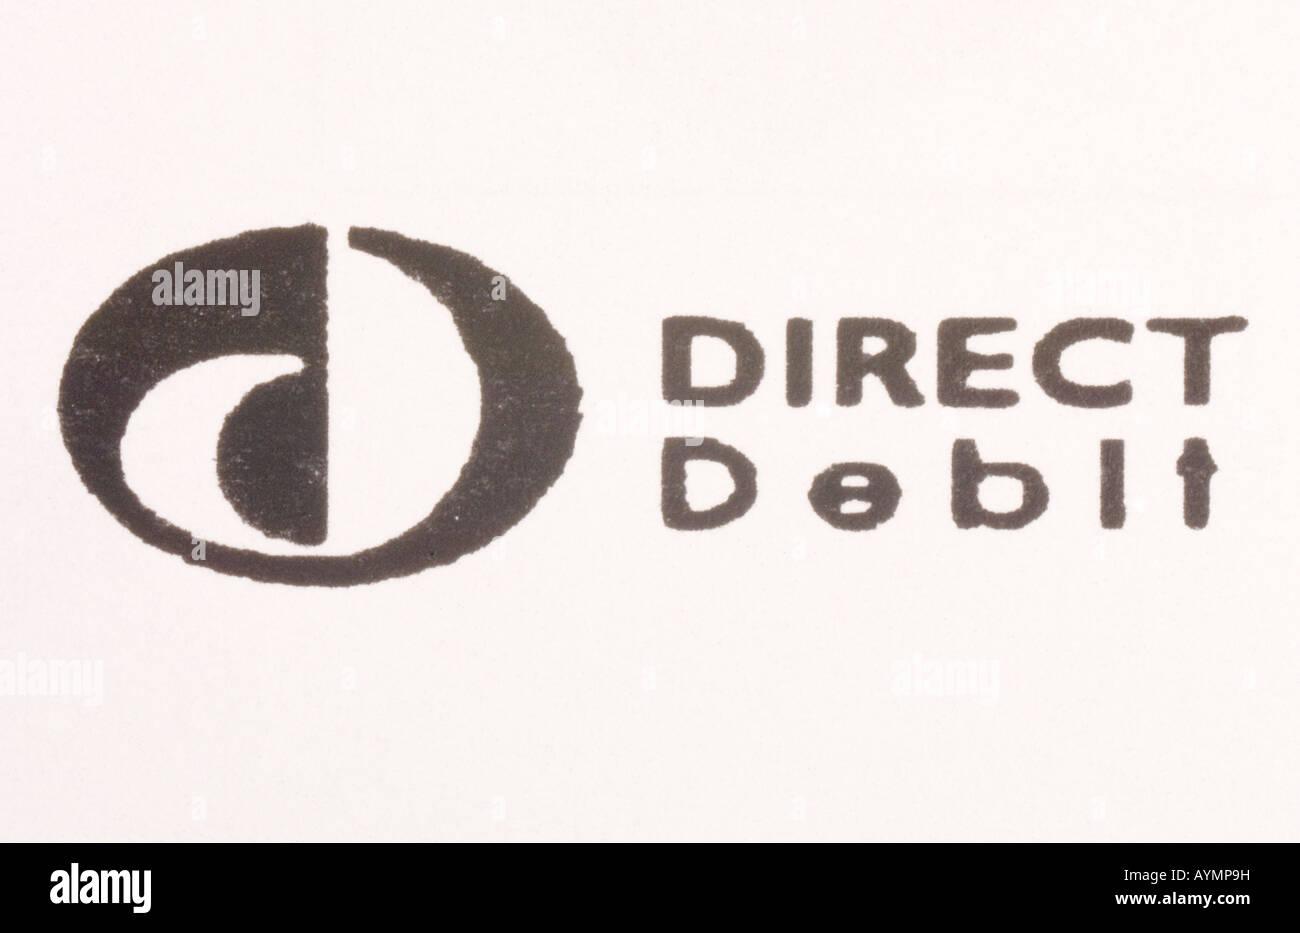 Direct Stockfotos & Direct Bilder - Alamy